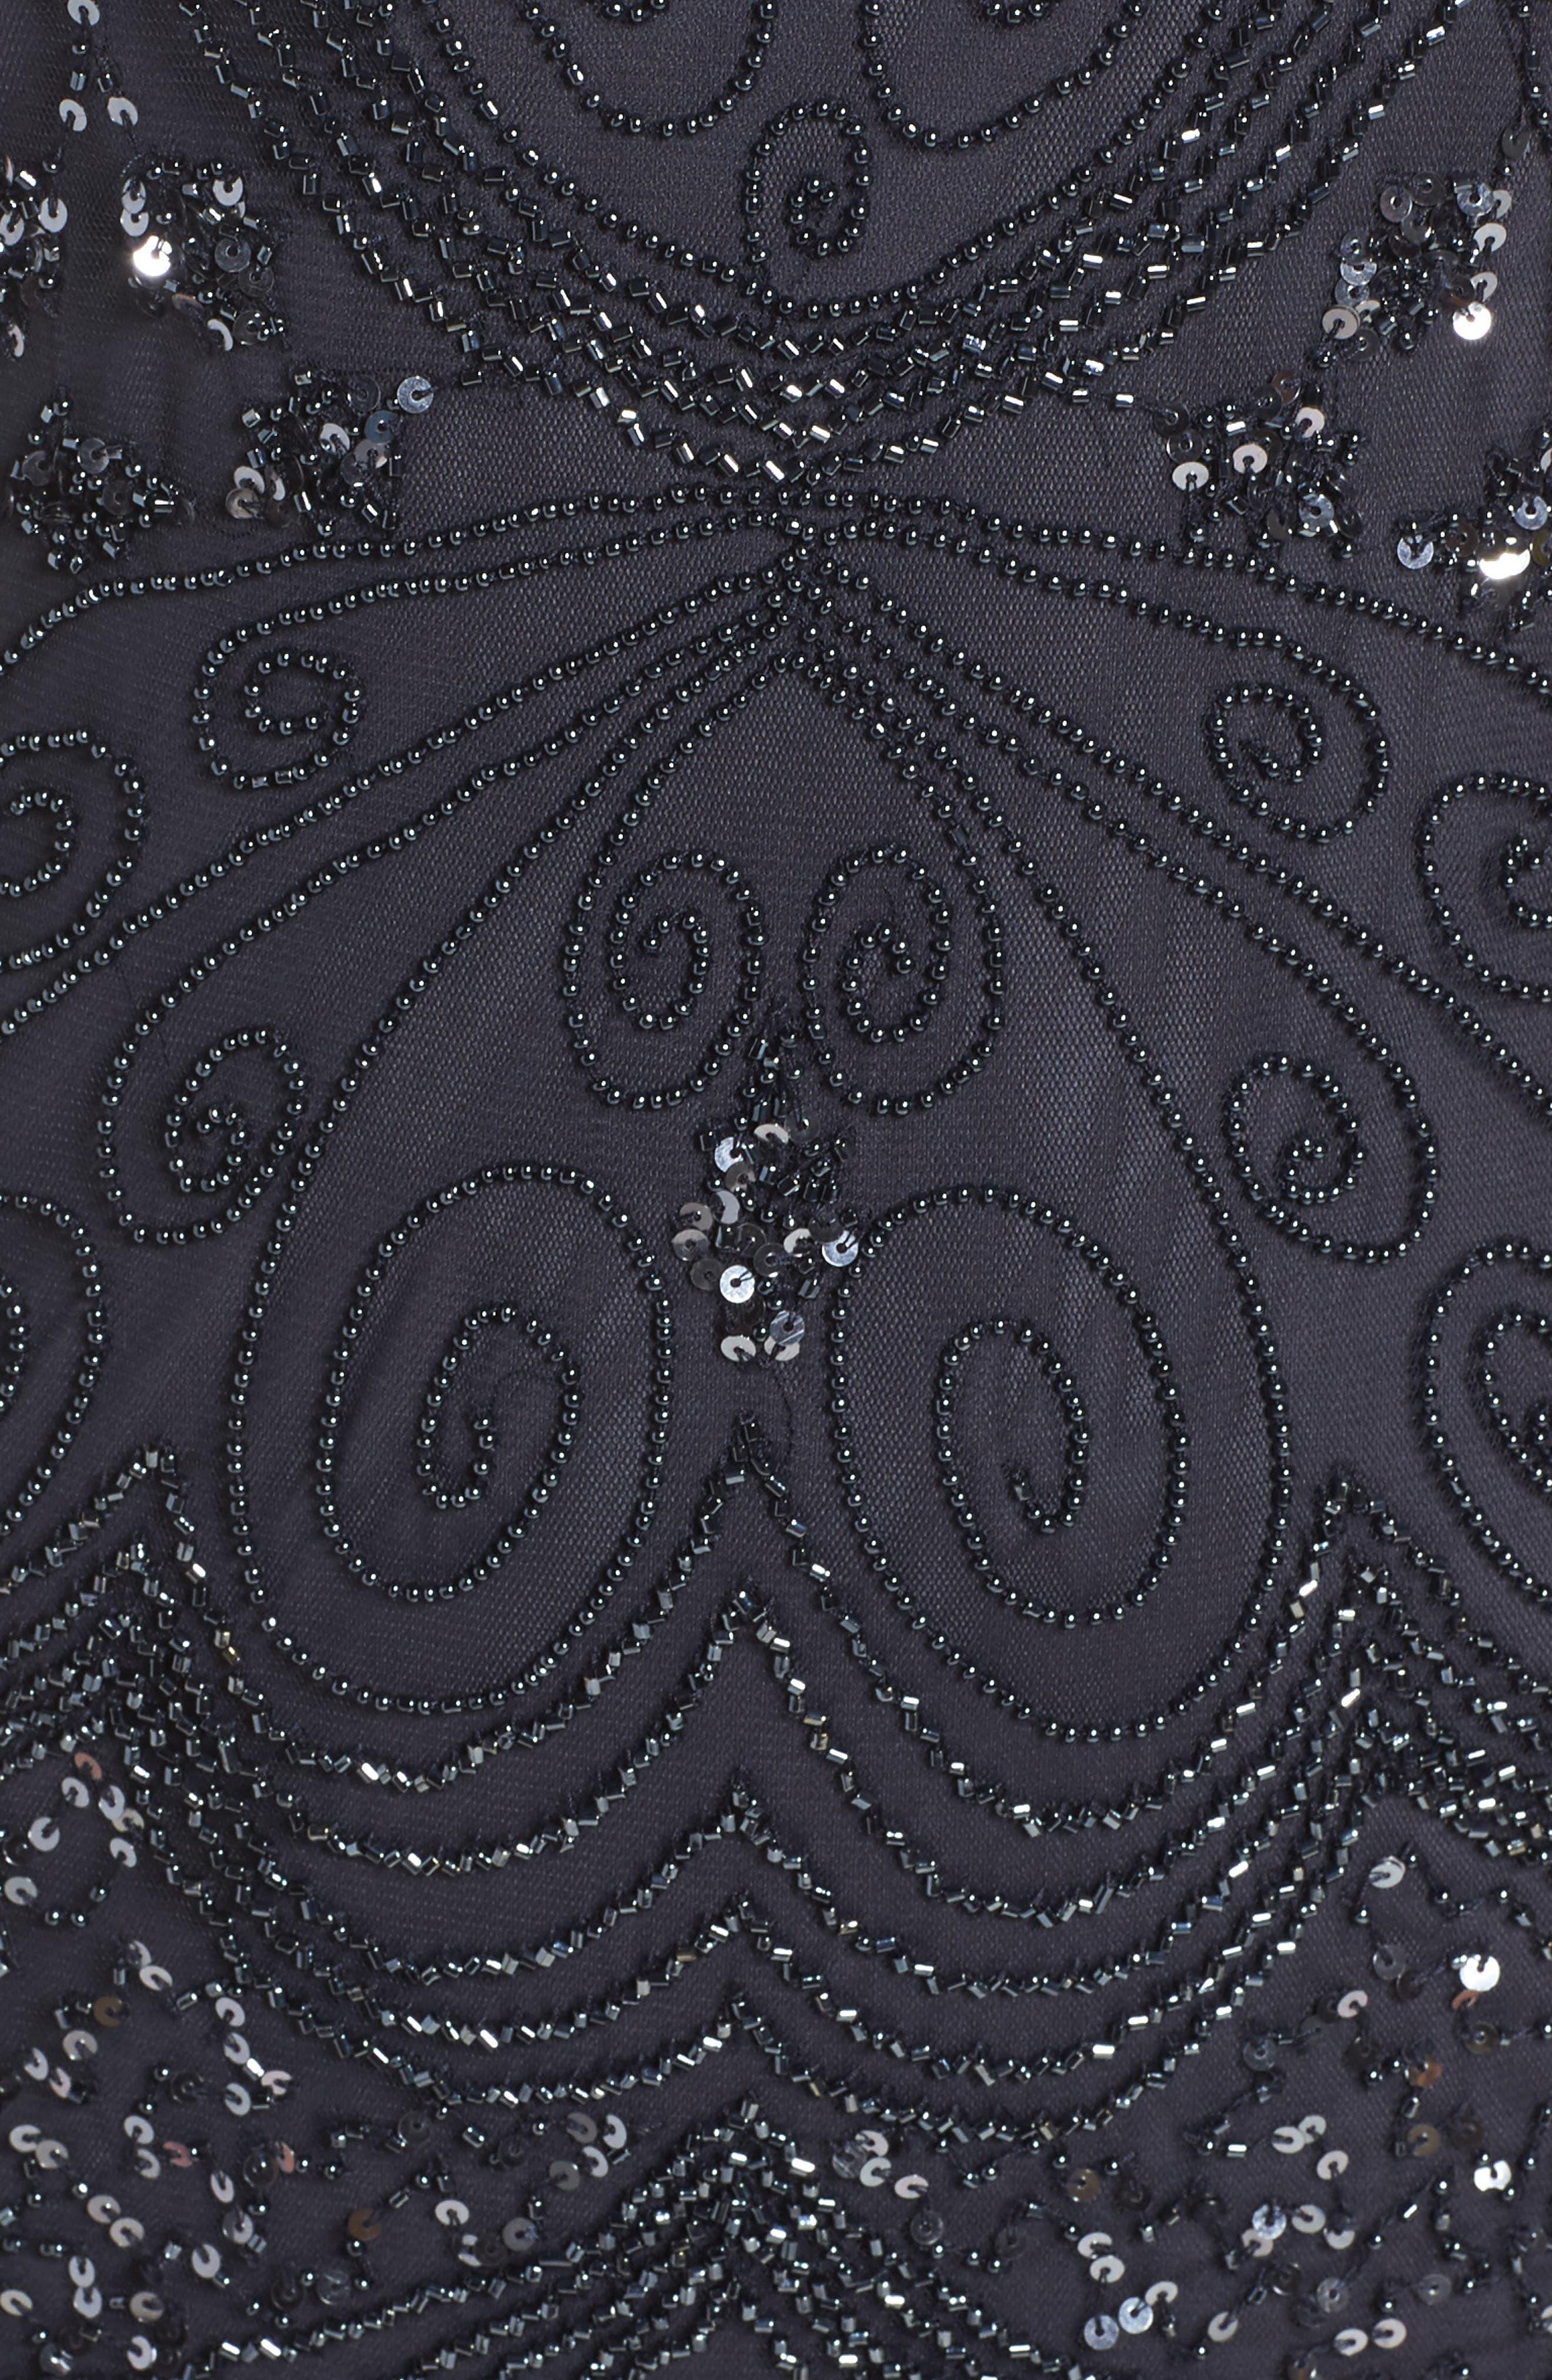 Beaded Sheath Dress,                             Alternate thumbnail 5, color,                             Charcoal